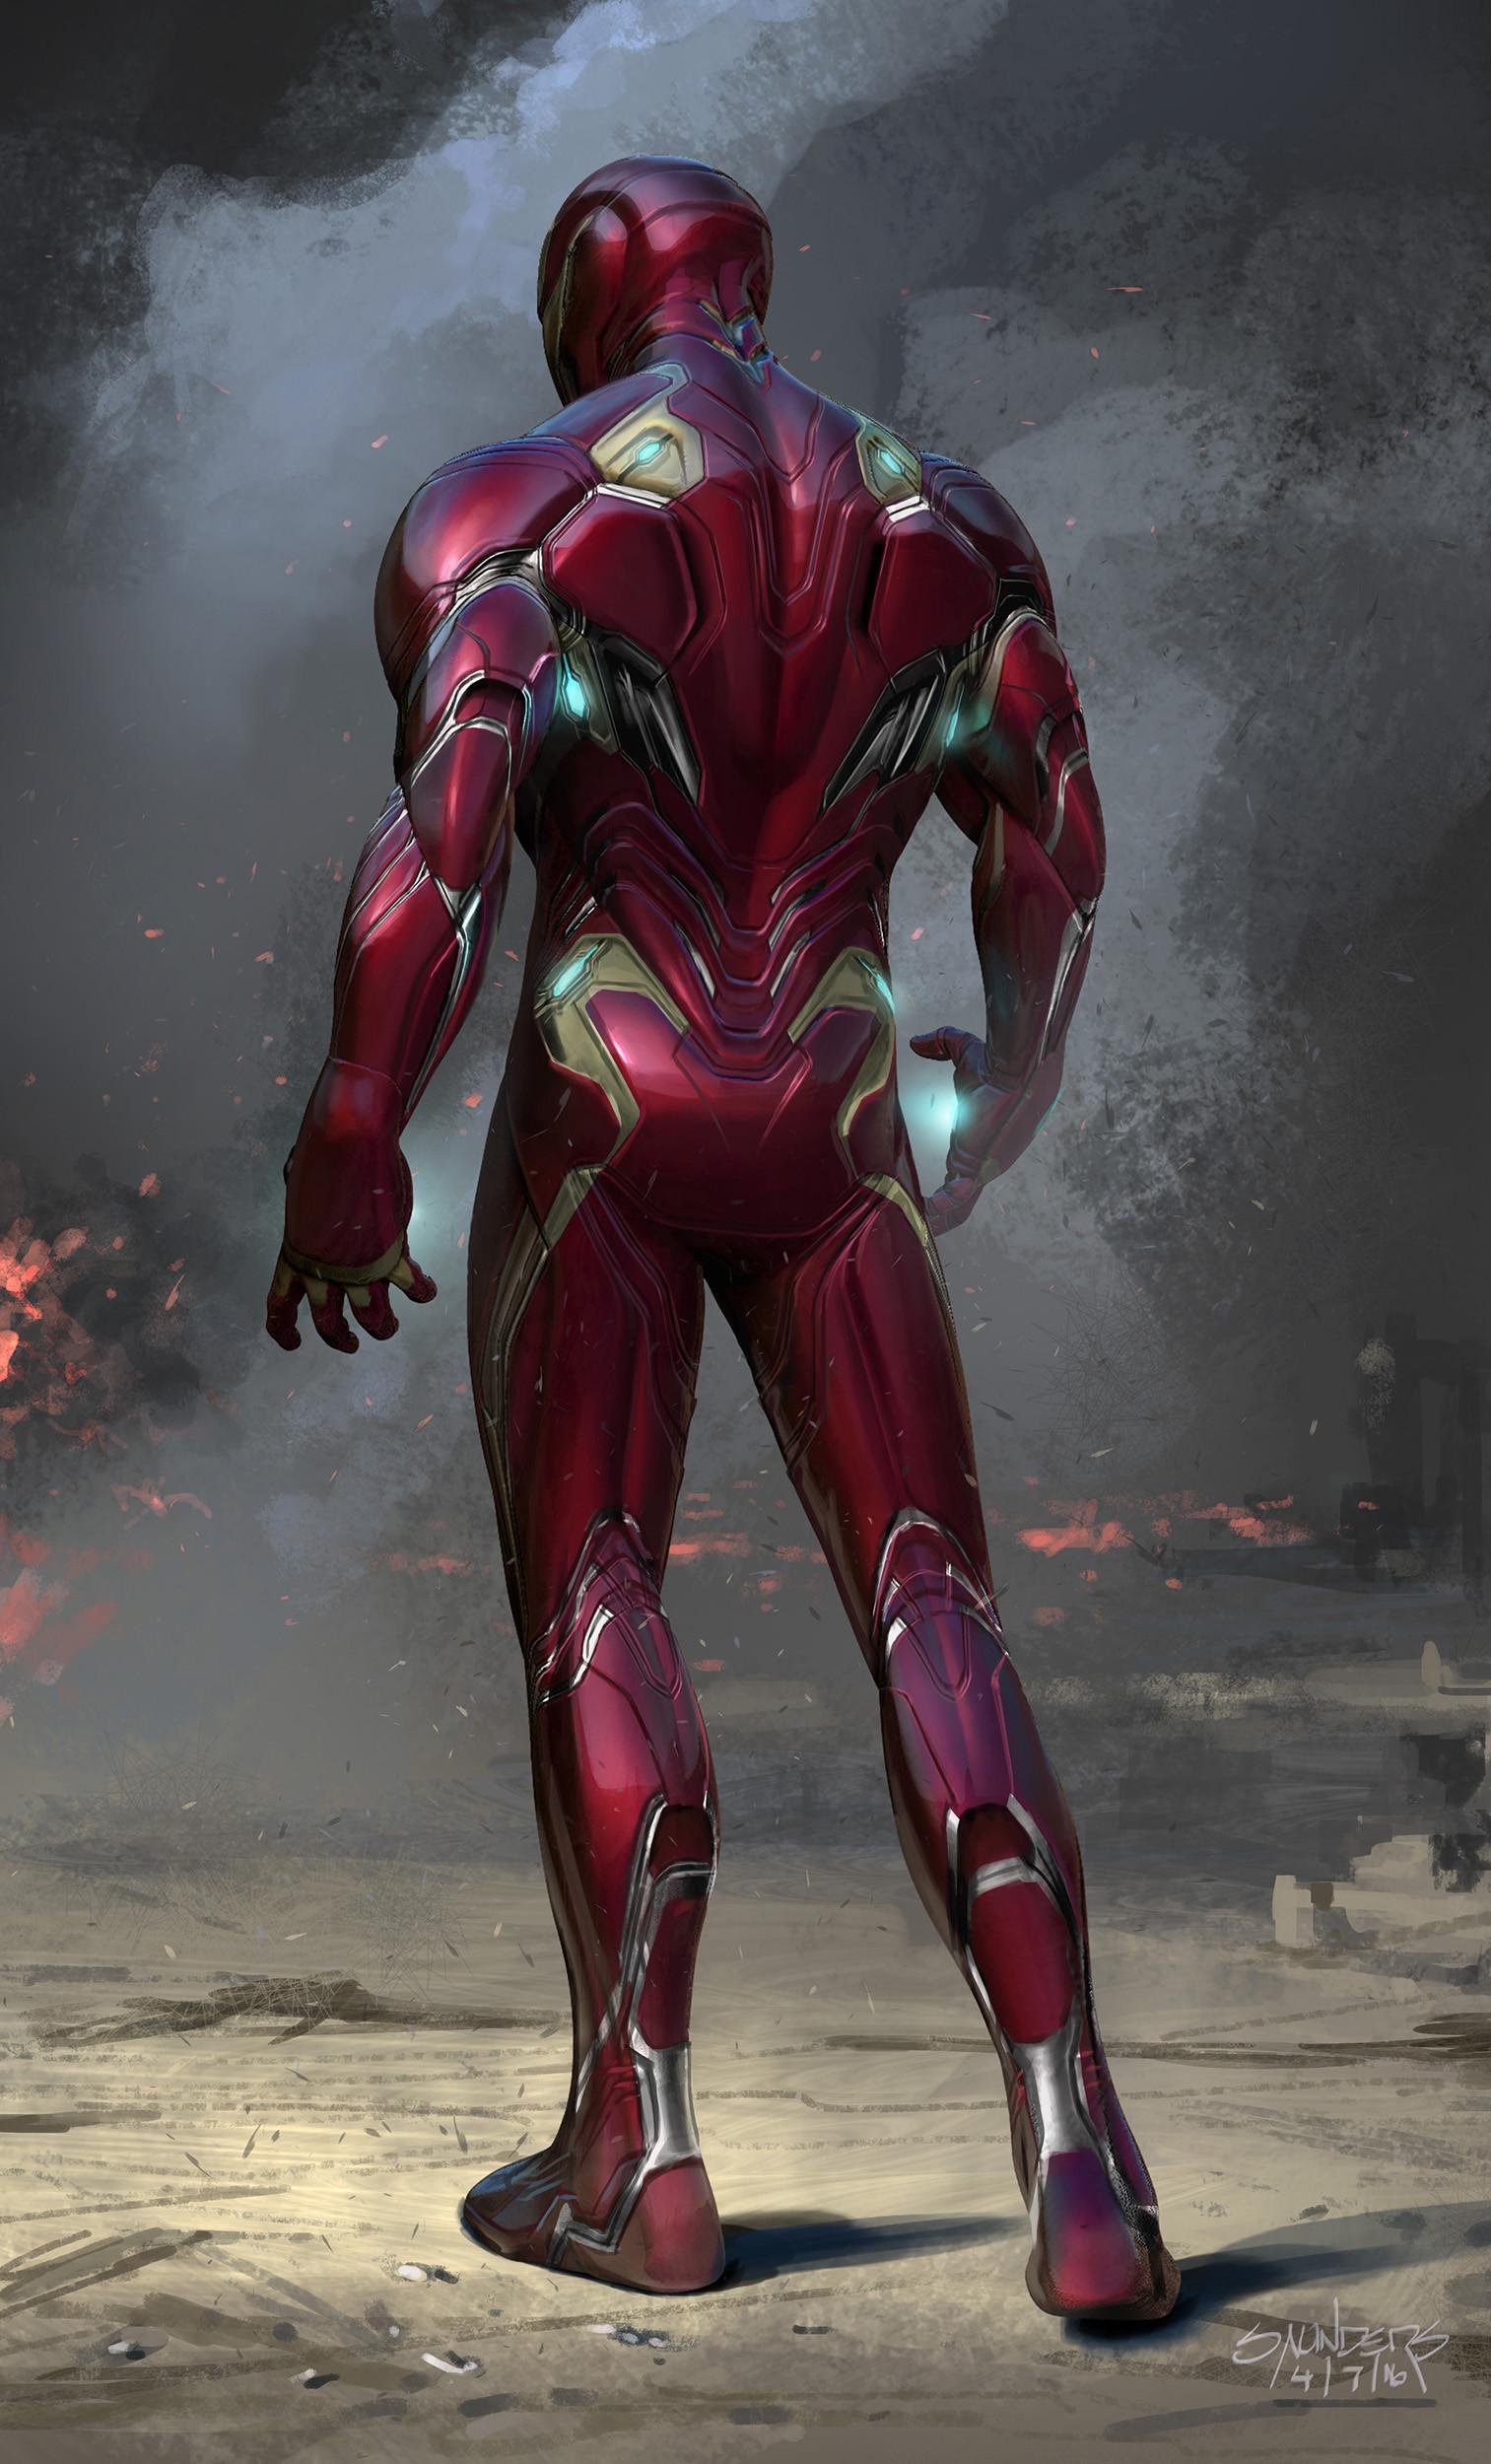 ArtStation - Avengers: Infinity War (2016) - Iron Man Mk 50